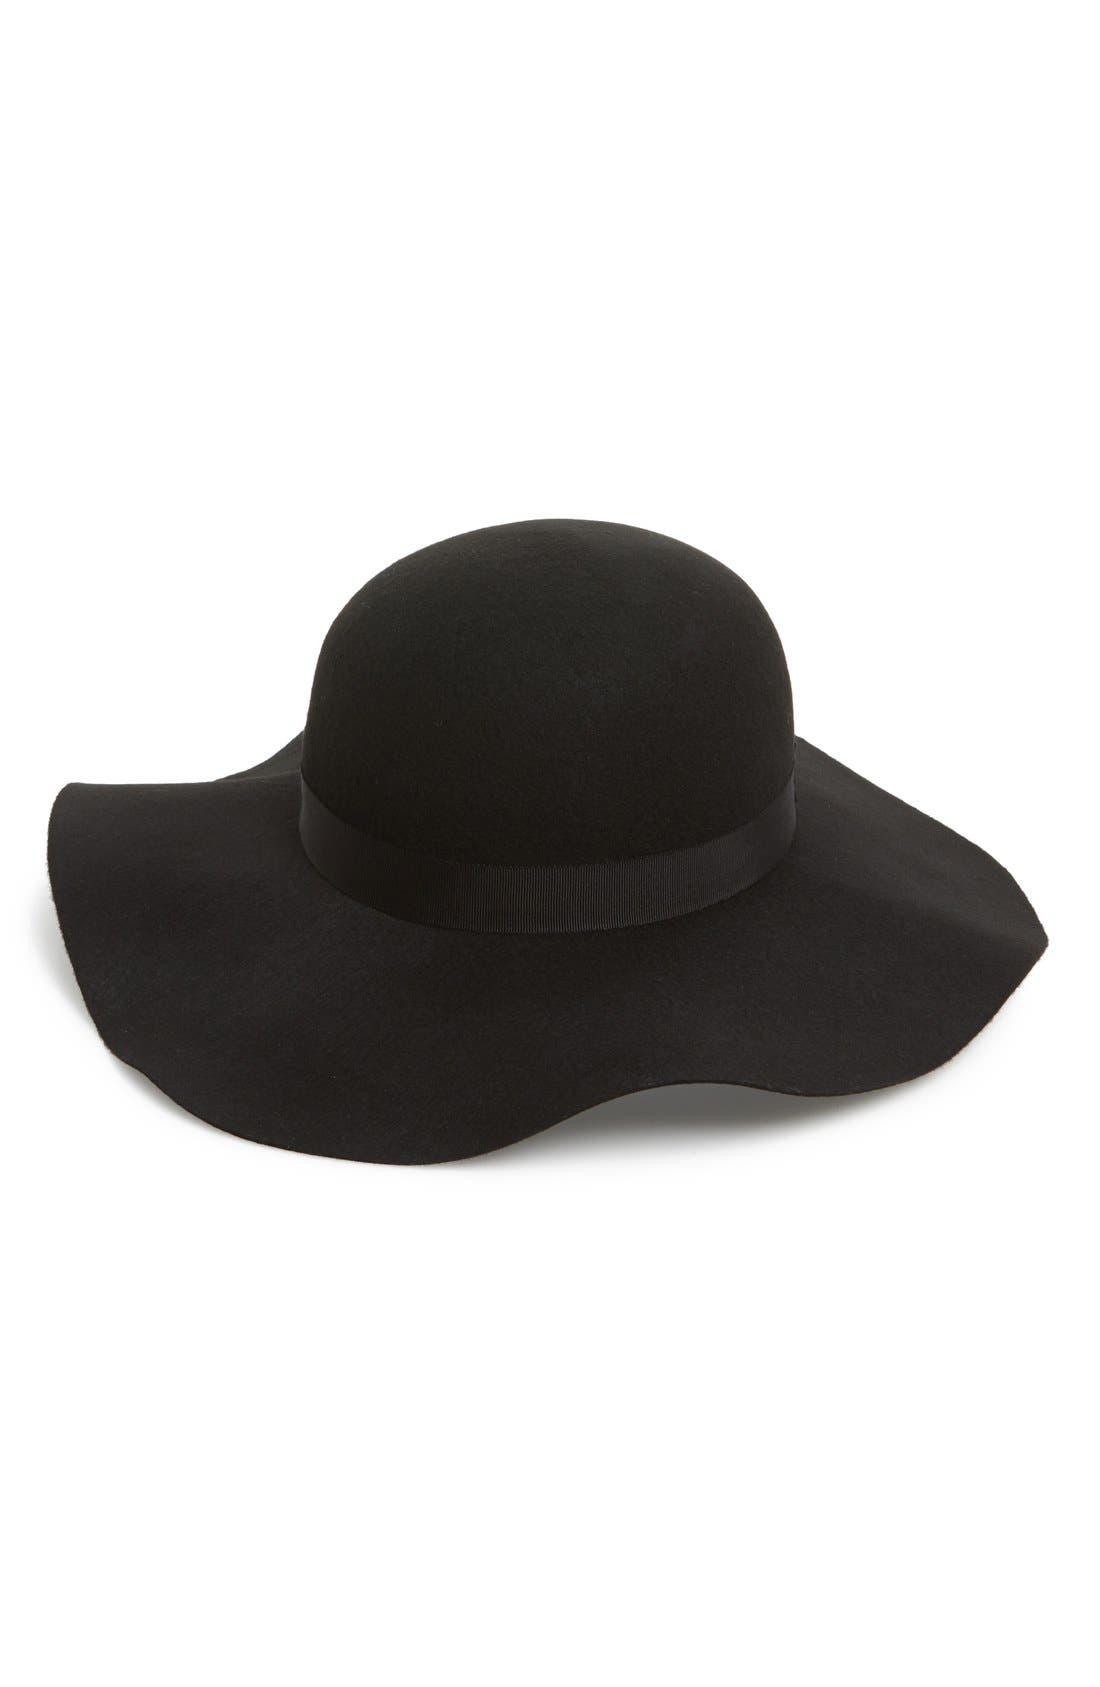 Floppy Felt Hat,                         Main,                         color, Black